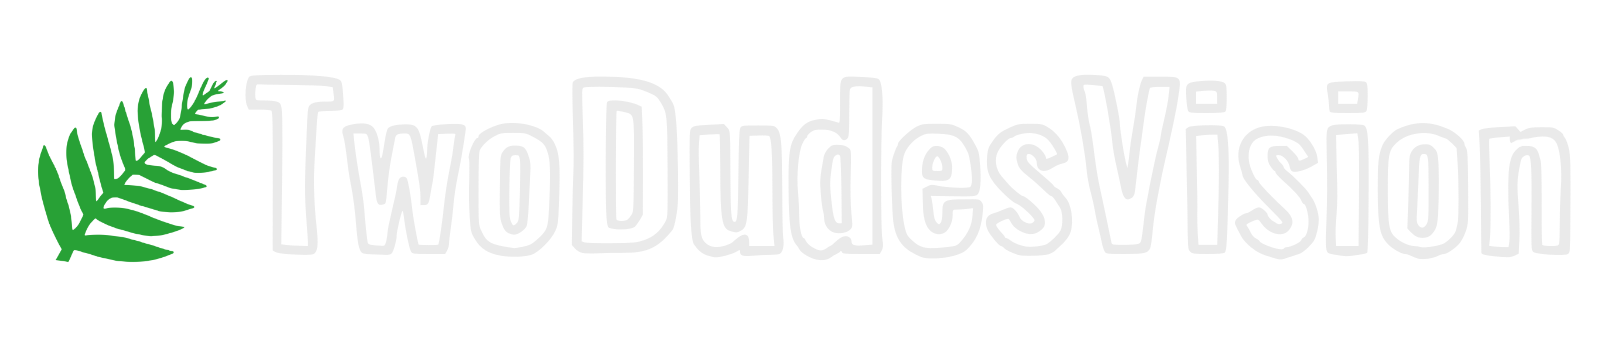 TwoDudesVision